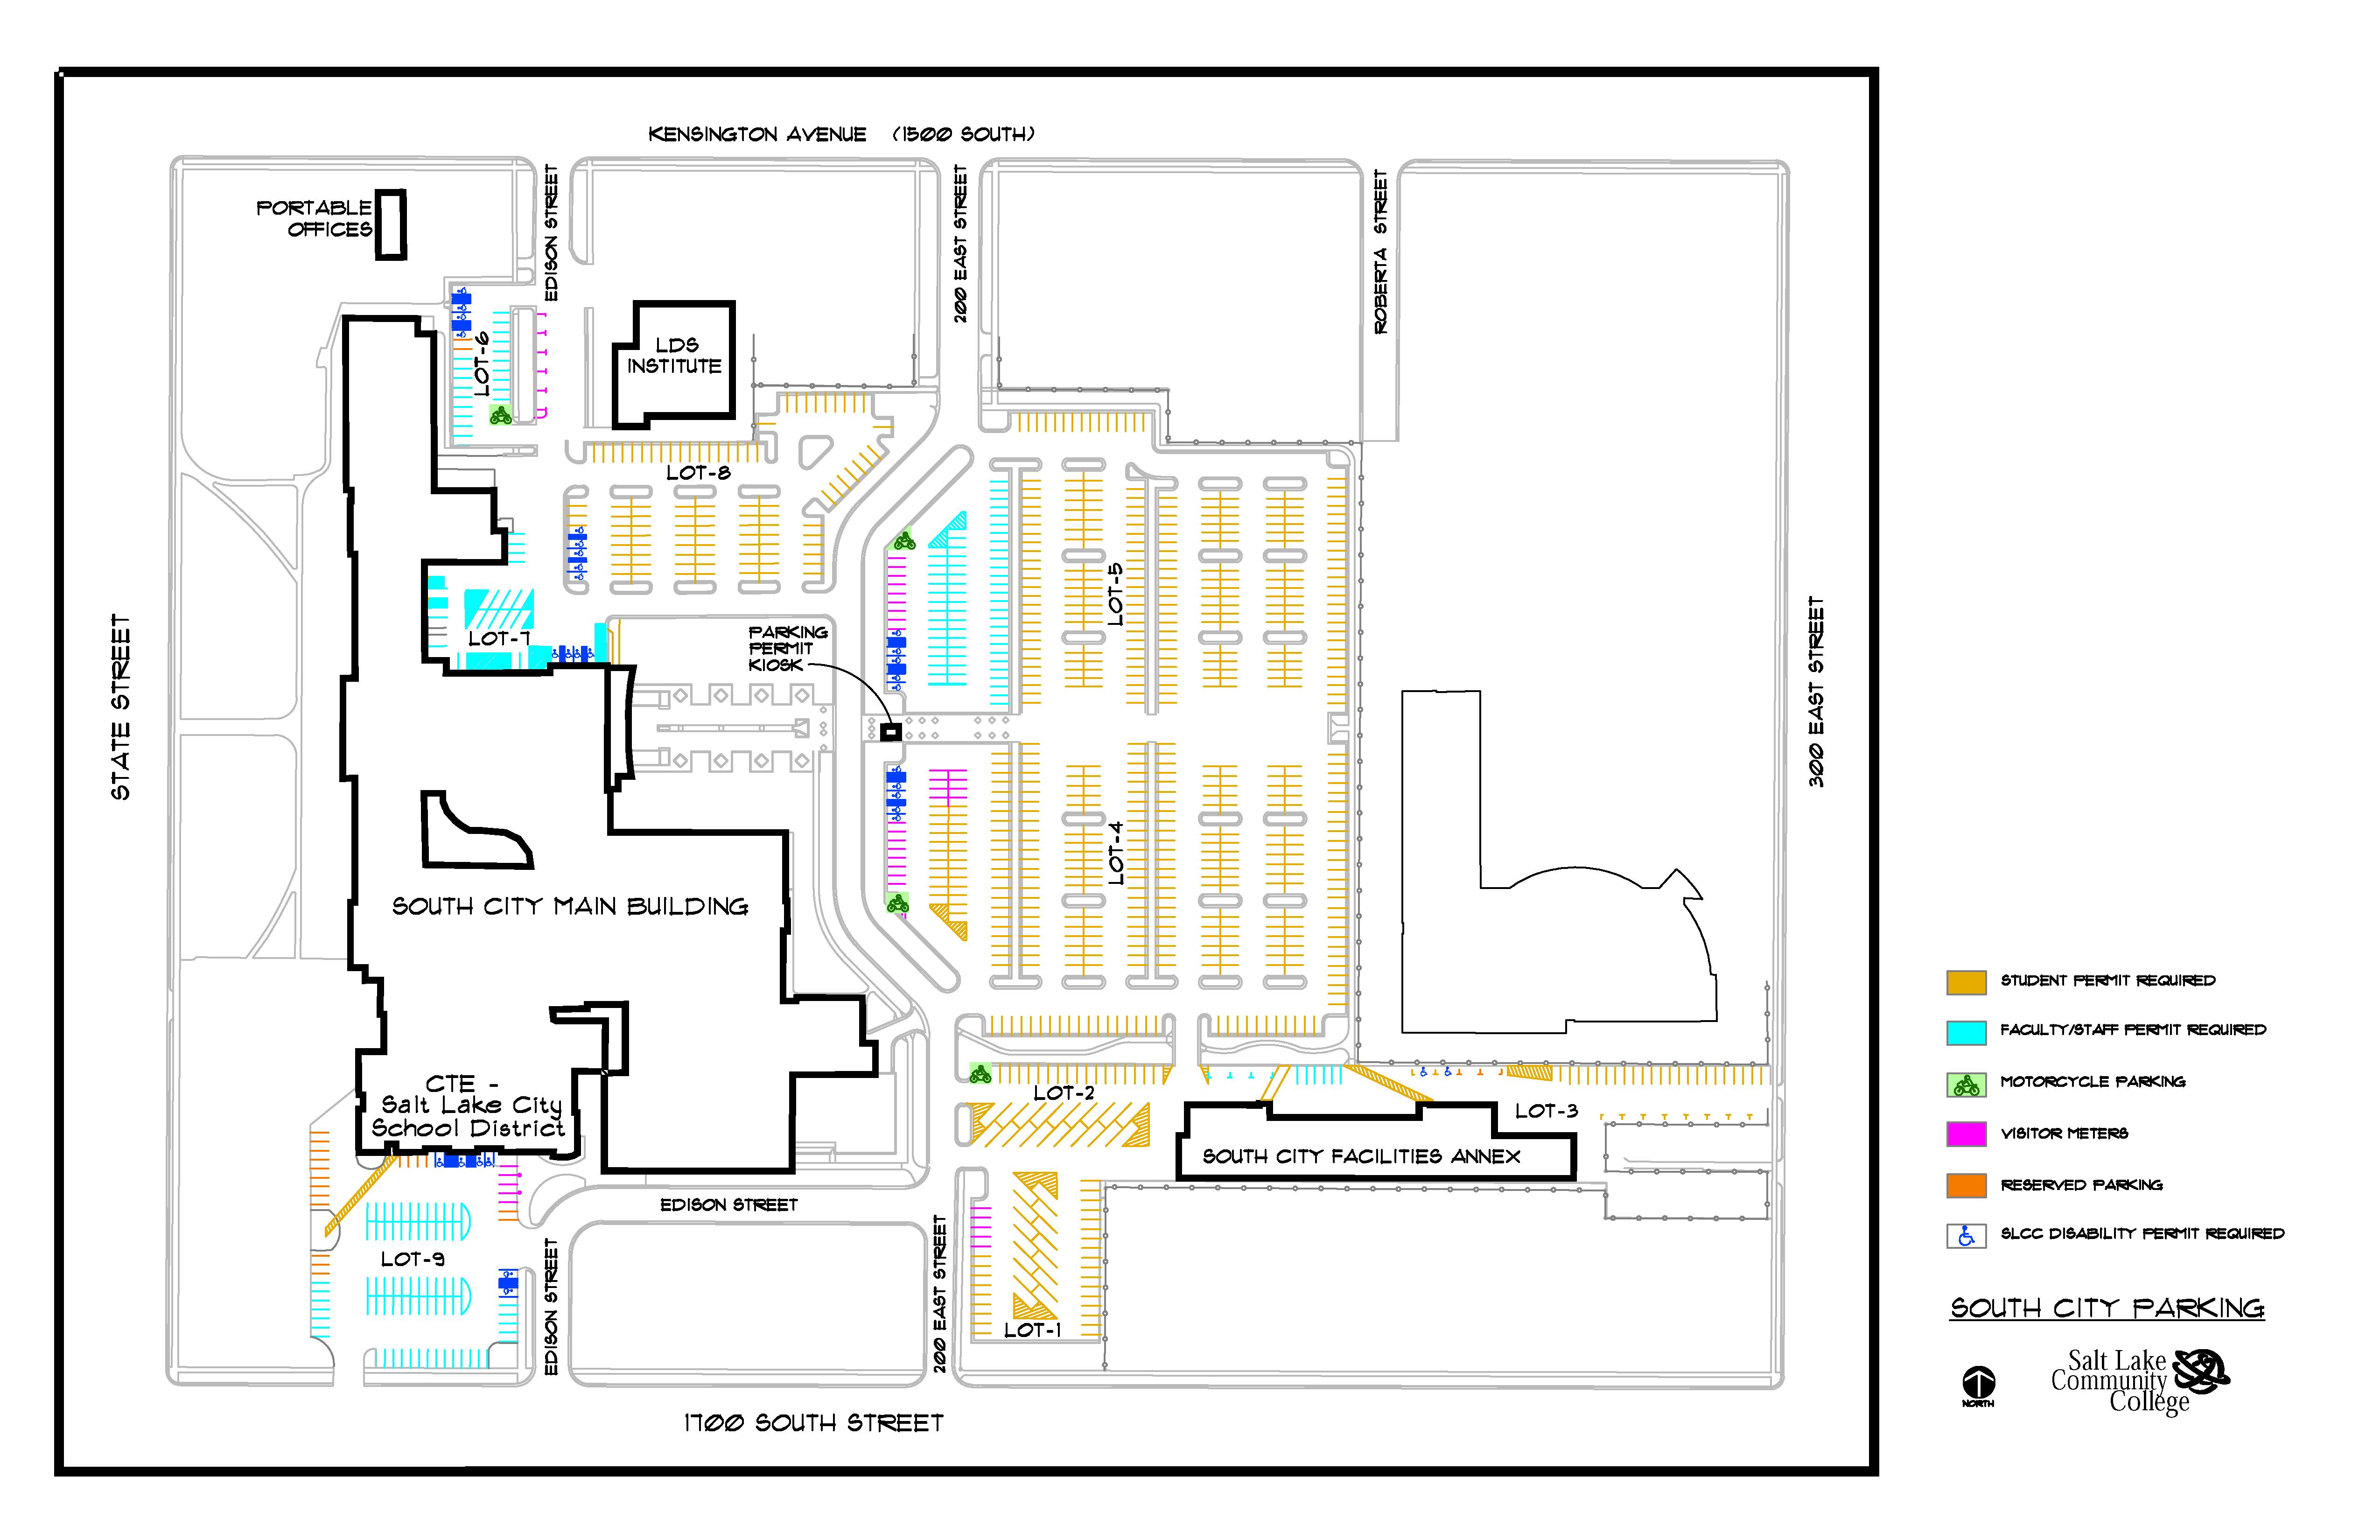 salt lake community college jordan campus map Parking Maps Slcc